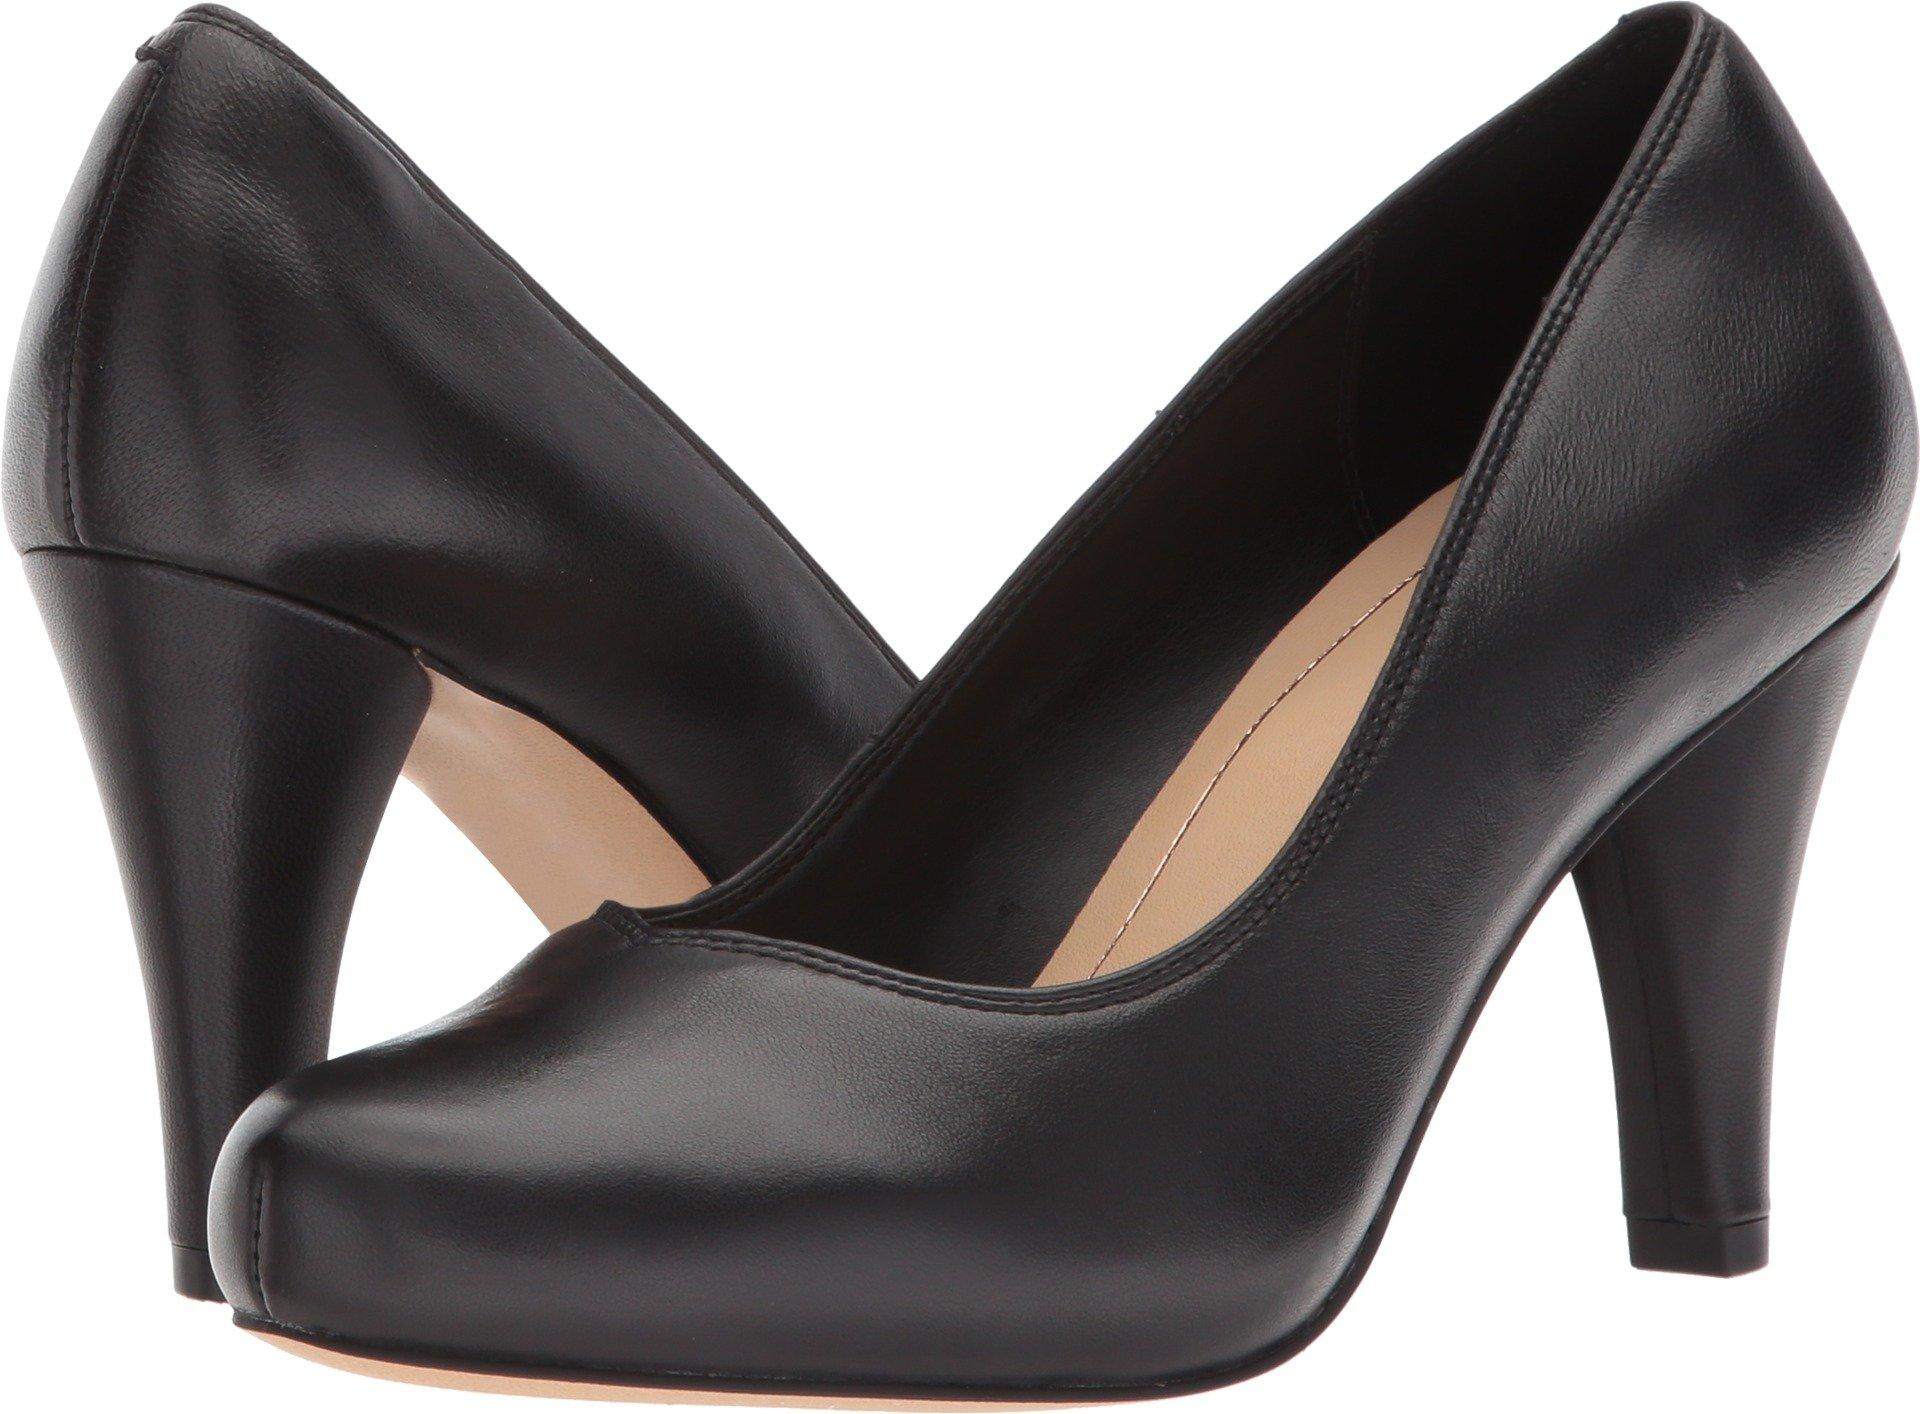 CLARKS Women's Dalia Rose Black Leather 9.5 B US by CLARKS